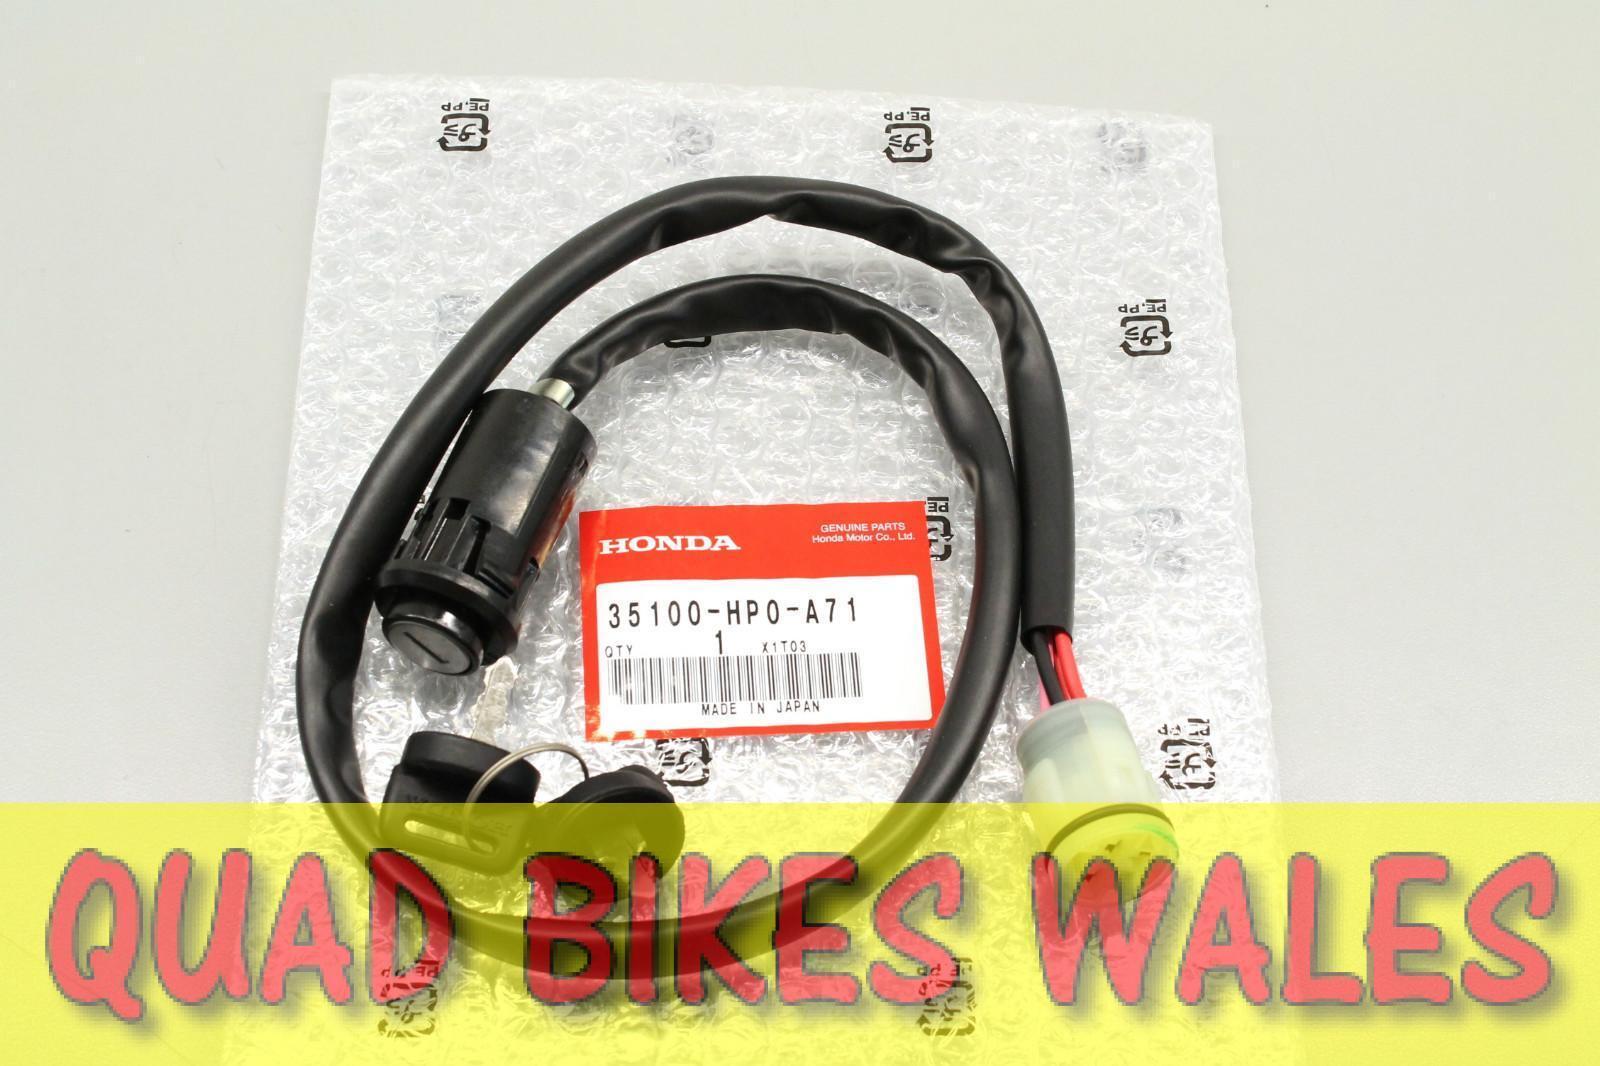 Honda TRX500FA//TRX500FGA Foreman Rubicon Schalt Winkel Sensor 2001-2014